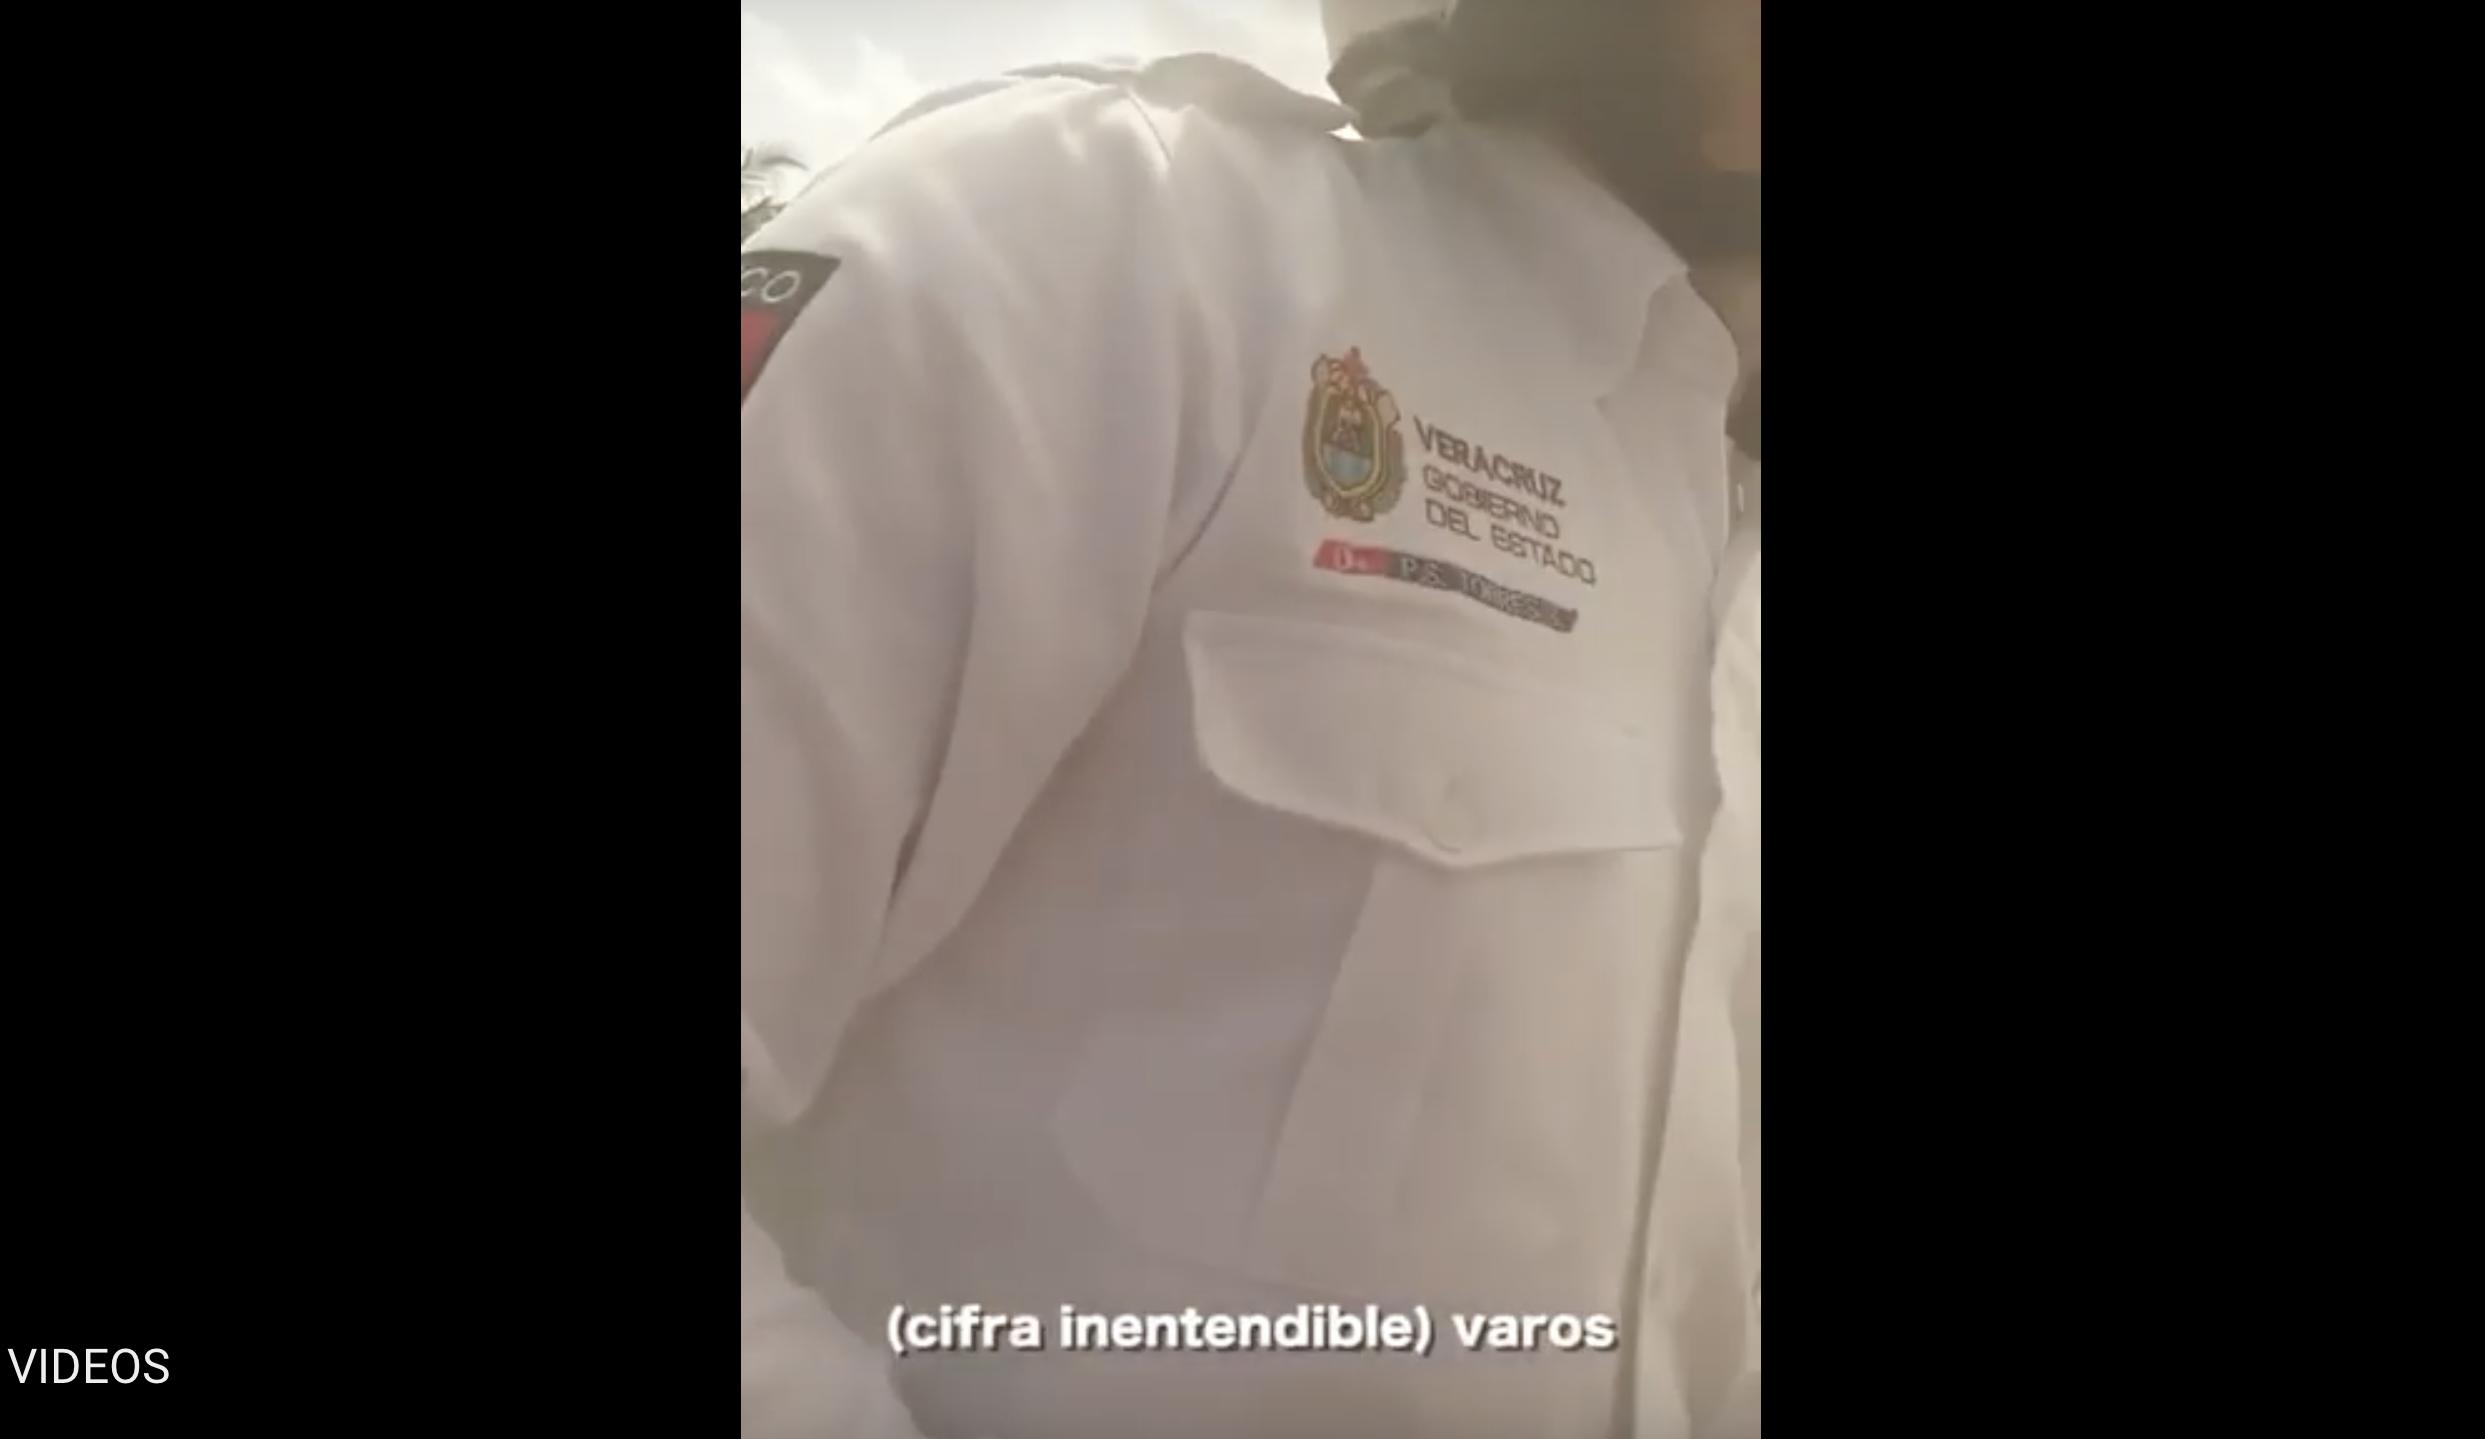 #VIDEO | Señalan a tránsitos de Medellín por presuntos actos de corrupción